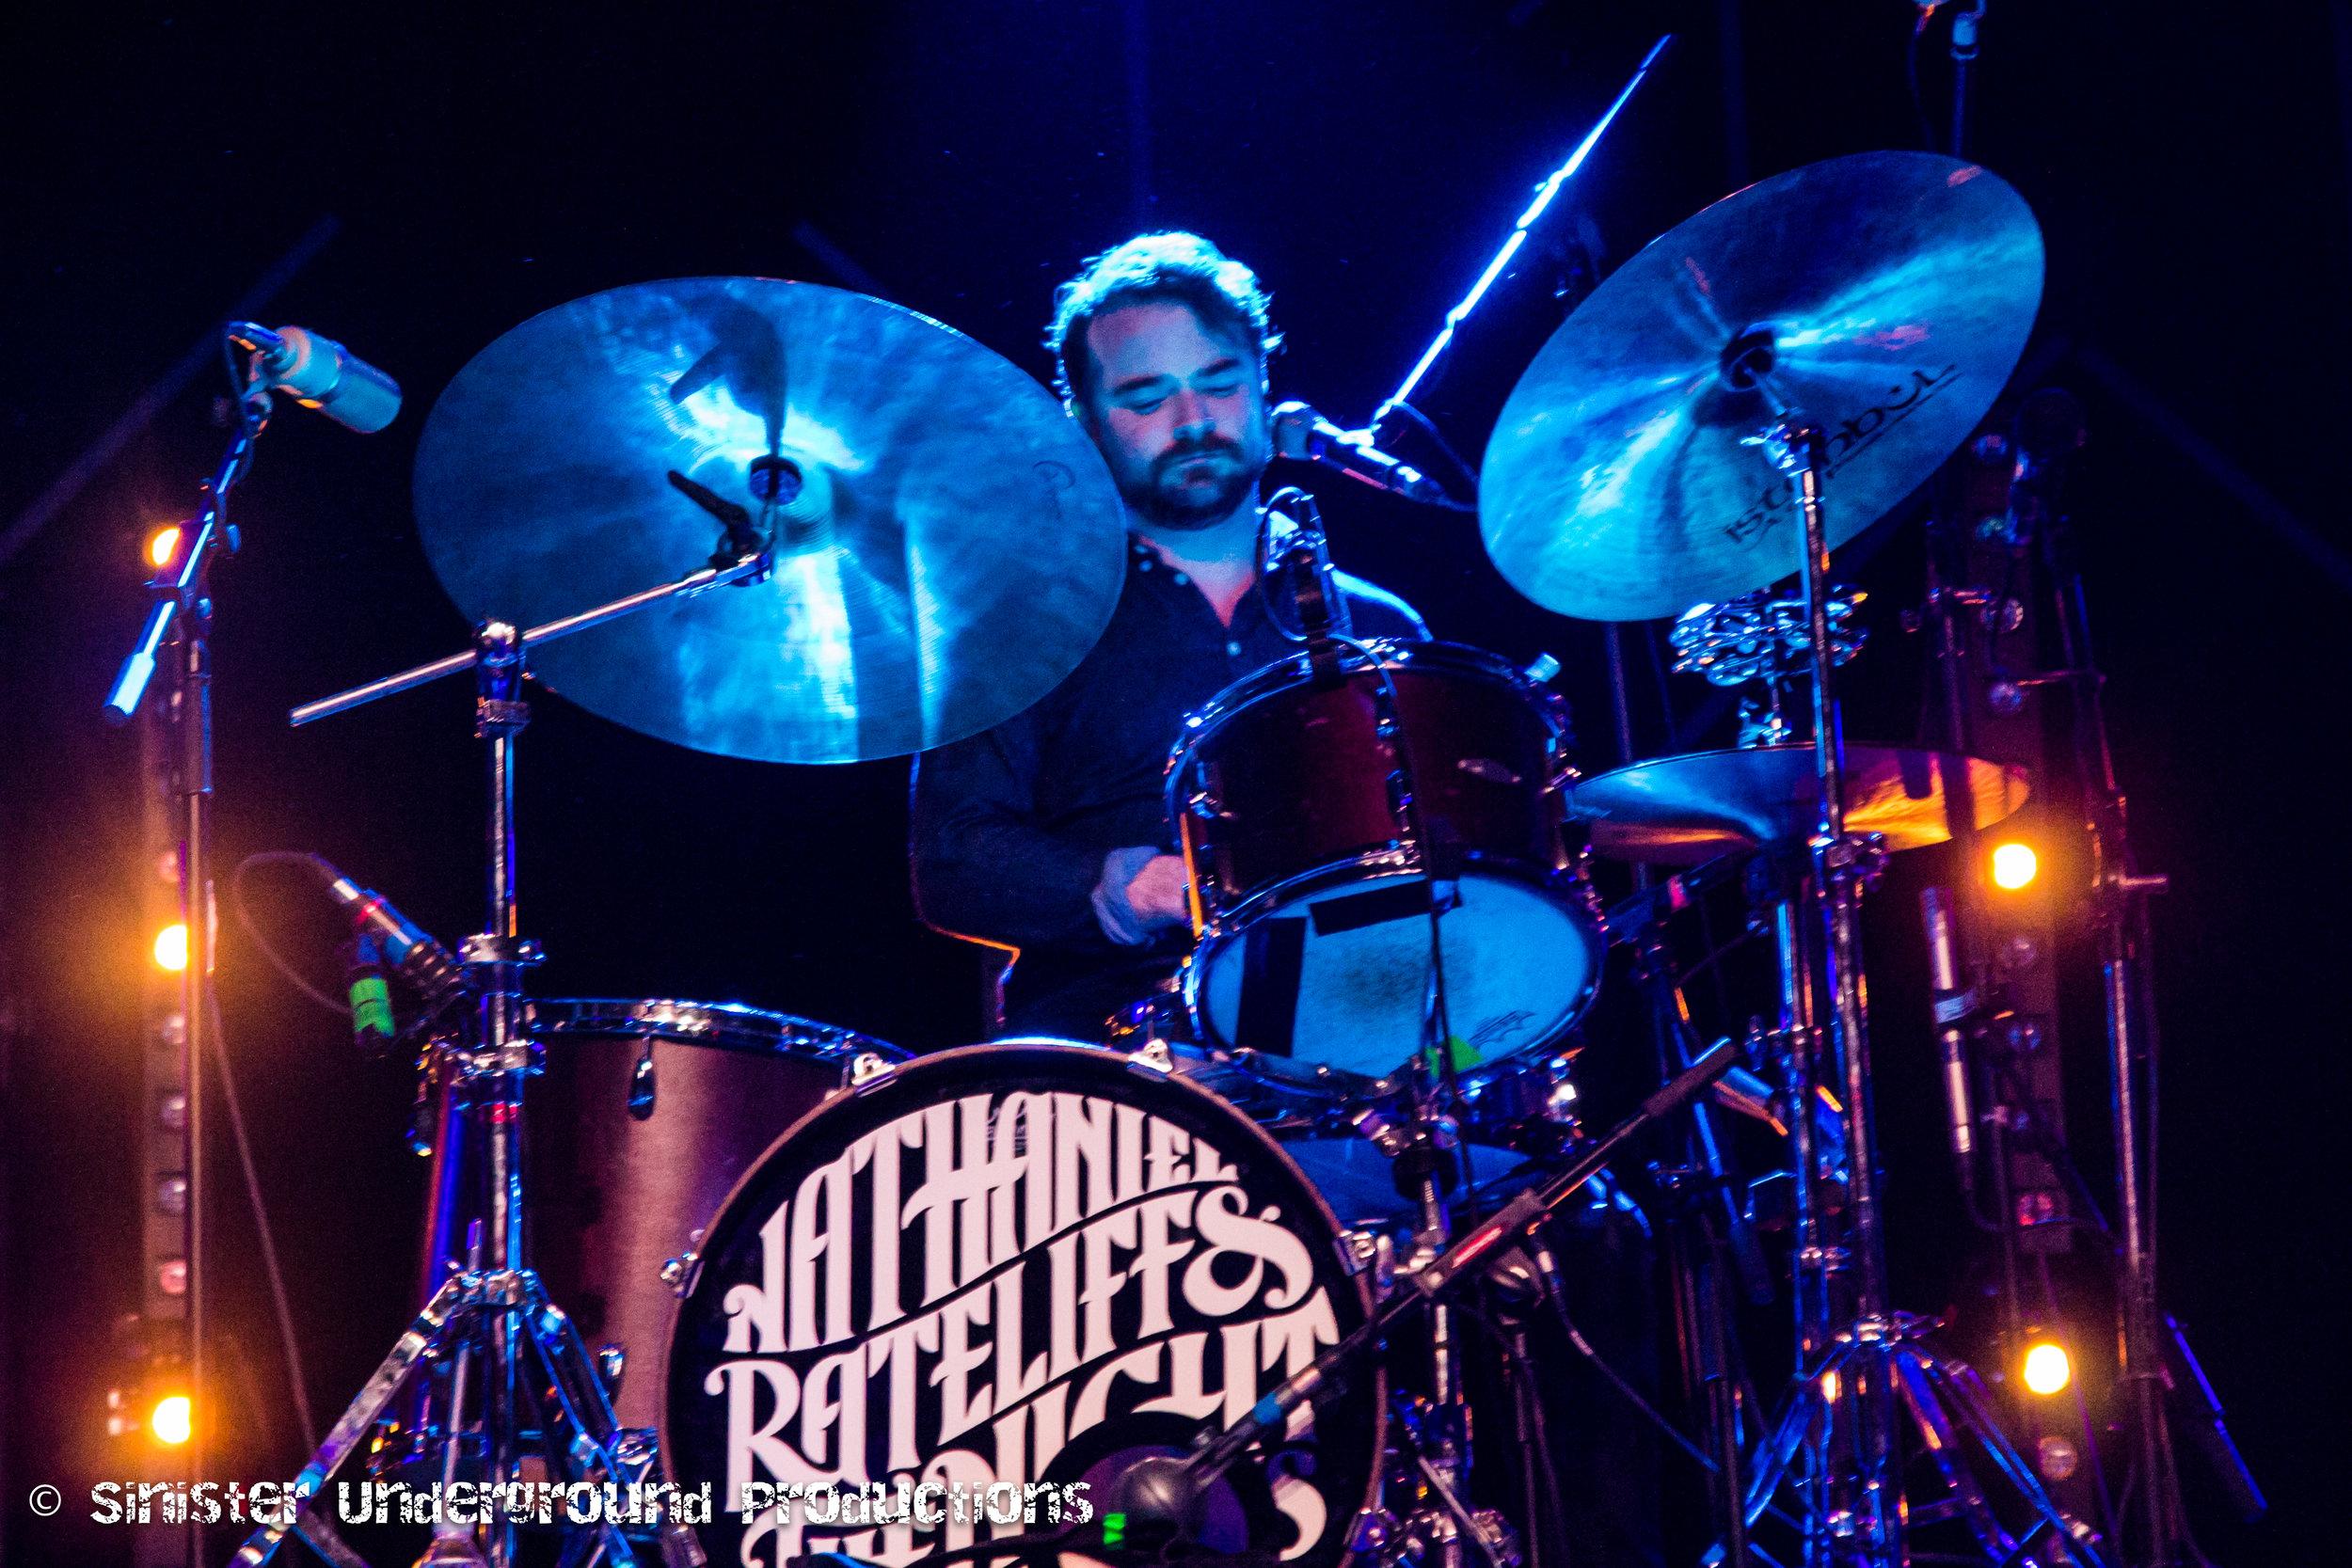 Nathaniel Rateliff and the Nightsweats